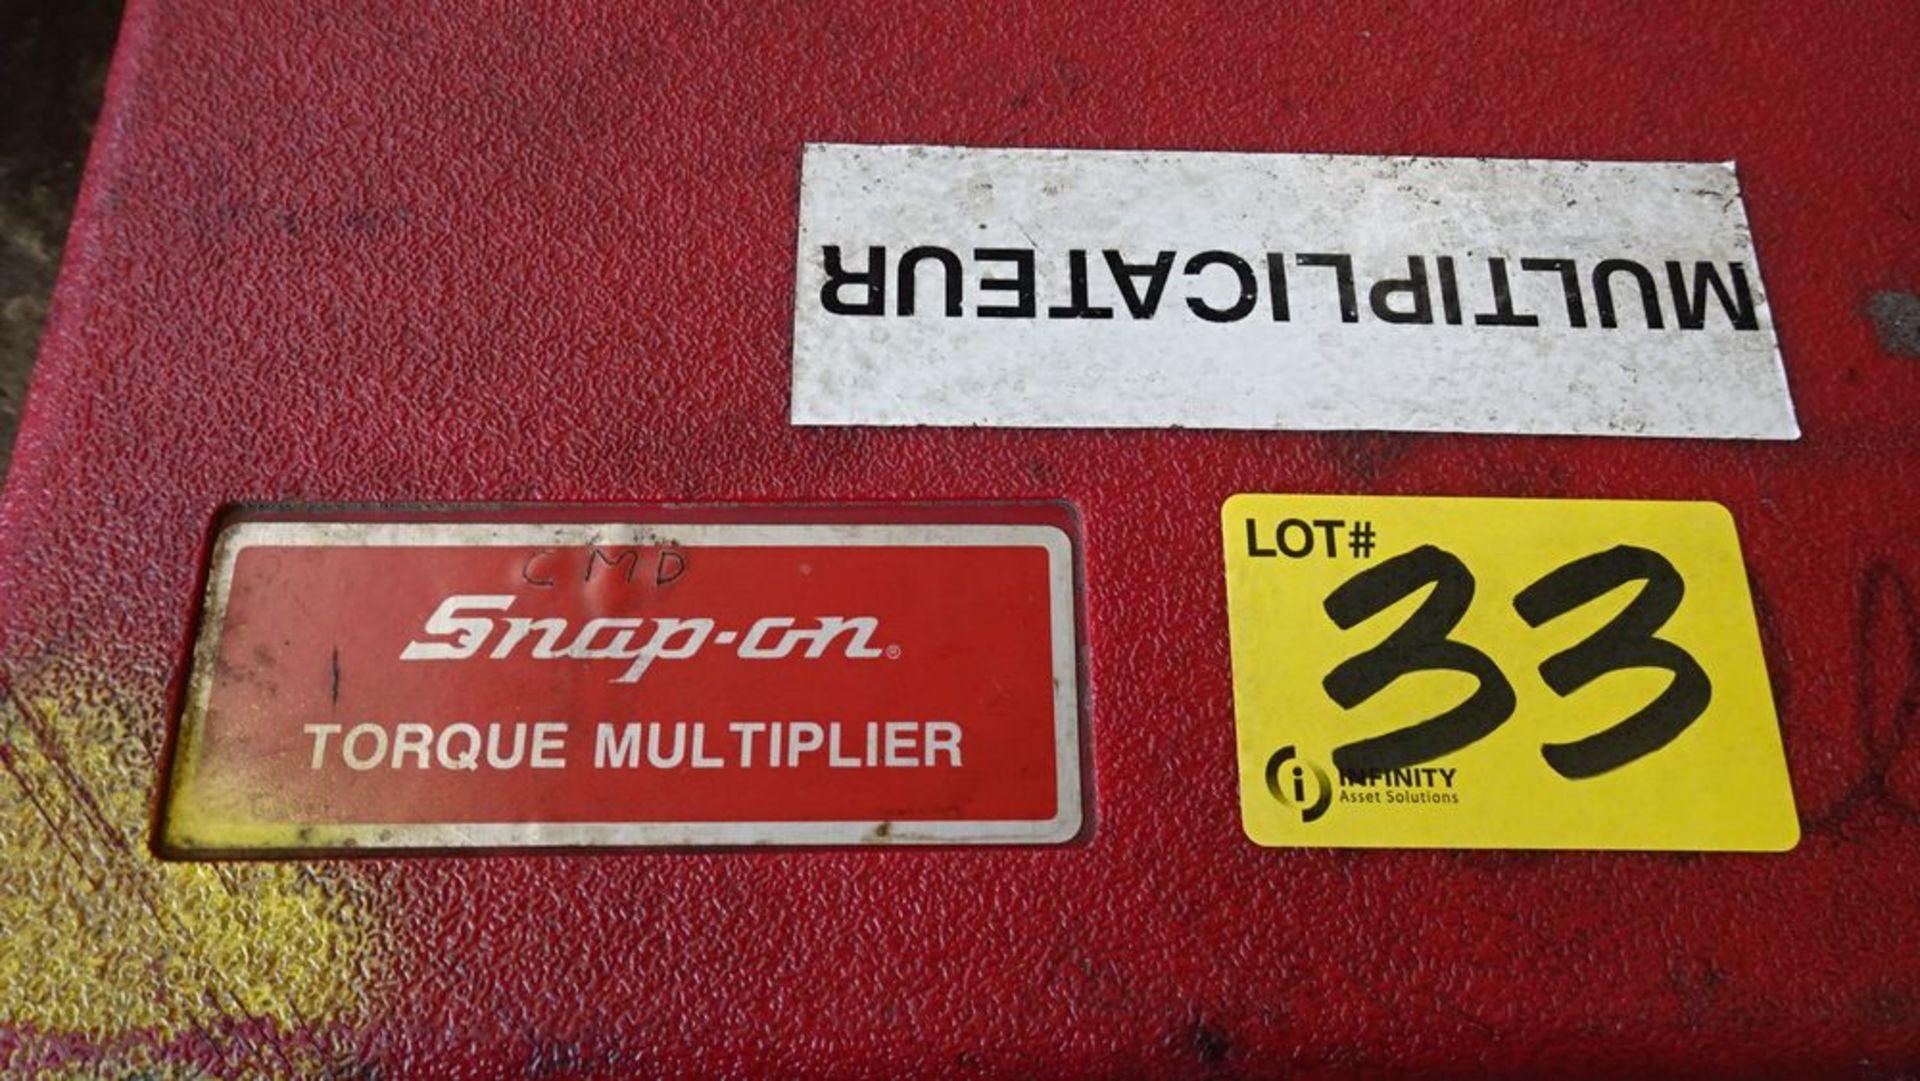 Lot 33 - SNAP-ON TORQUE MULTIPLIER C/W CASE